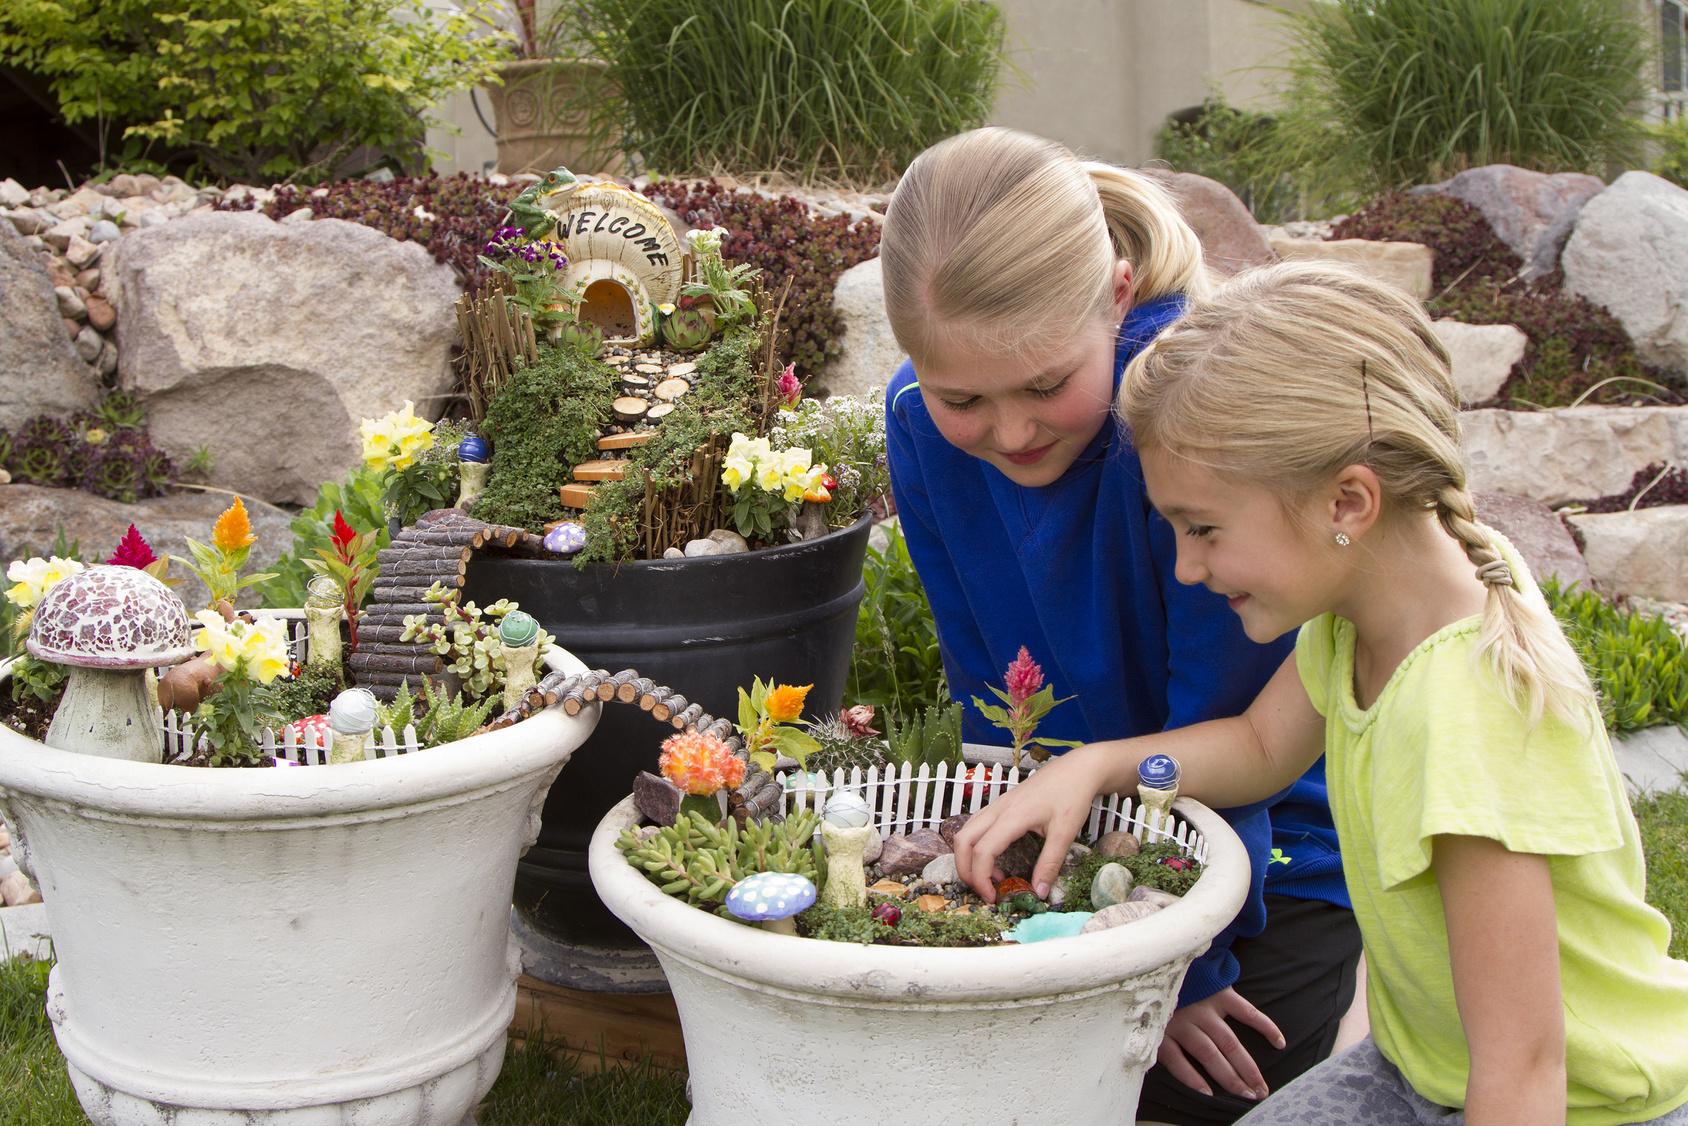 Rustoleum ReColor by Wipe New DIY Fairy Garden